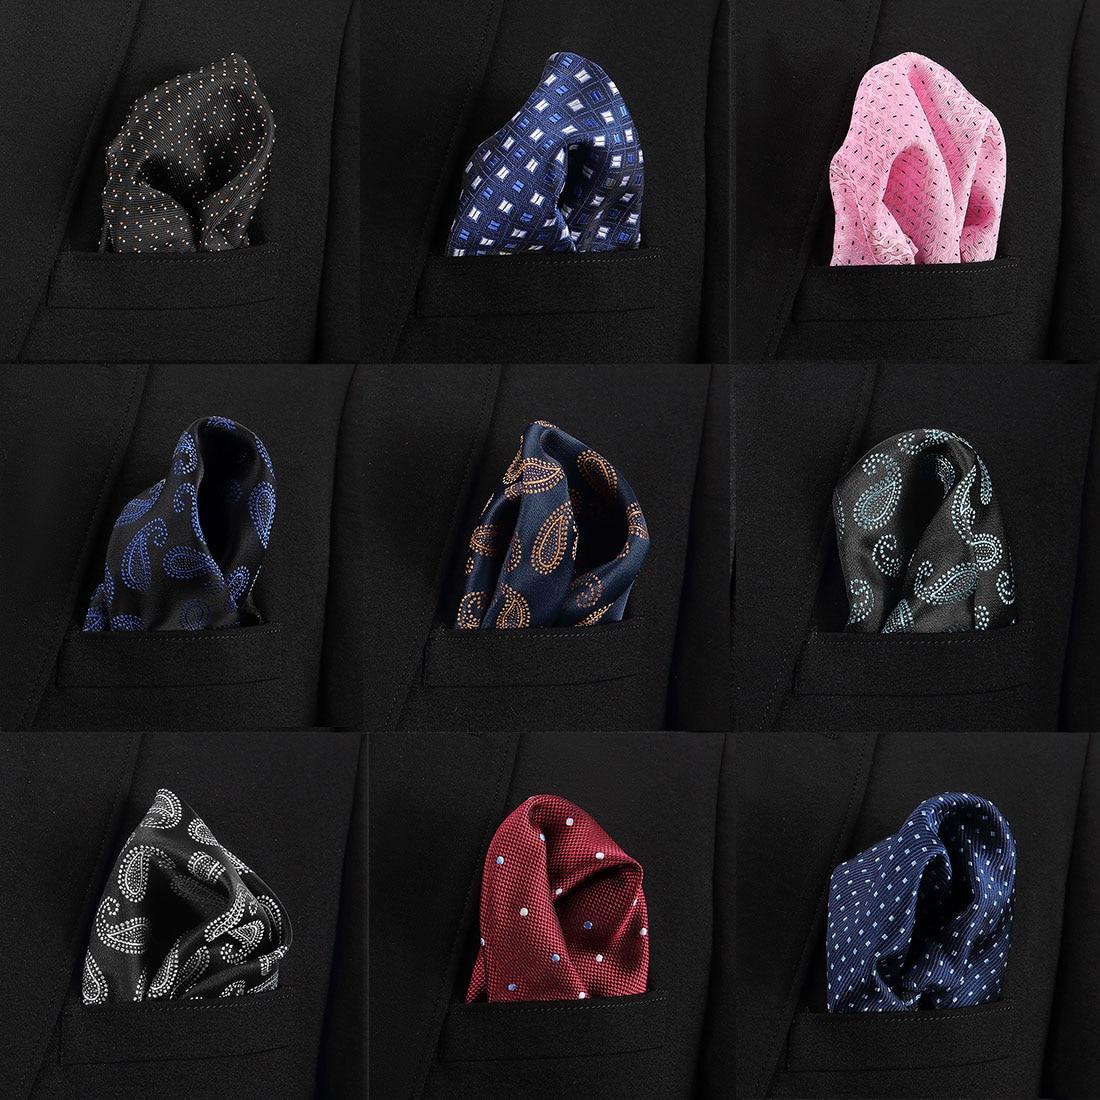 New Luxury  Hankerchief  Scarves Vintage Silk  Paisley Hankies Men's Pocket Square Handkerchiefs Chest Towel